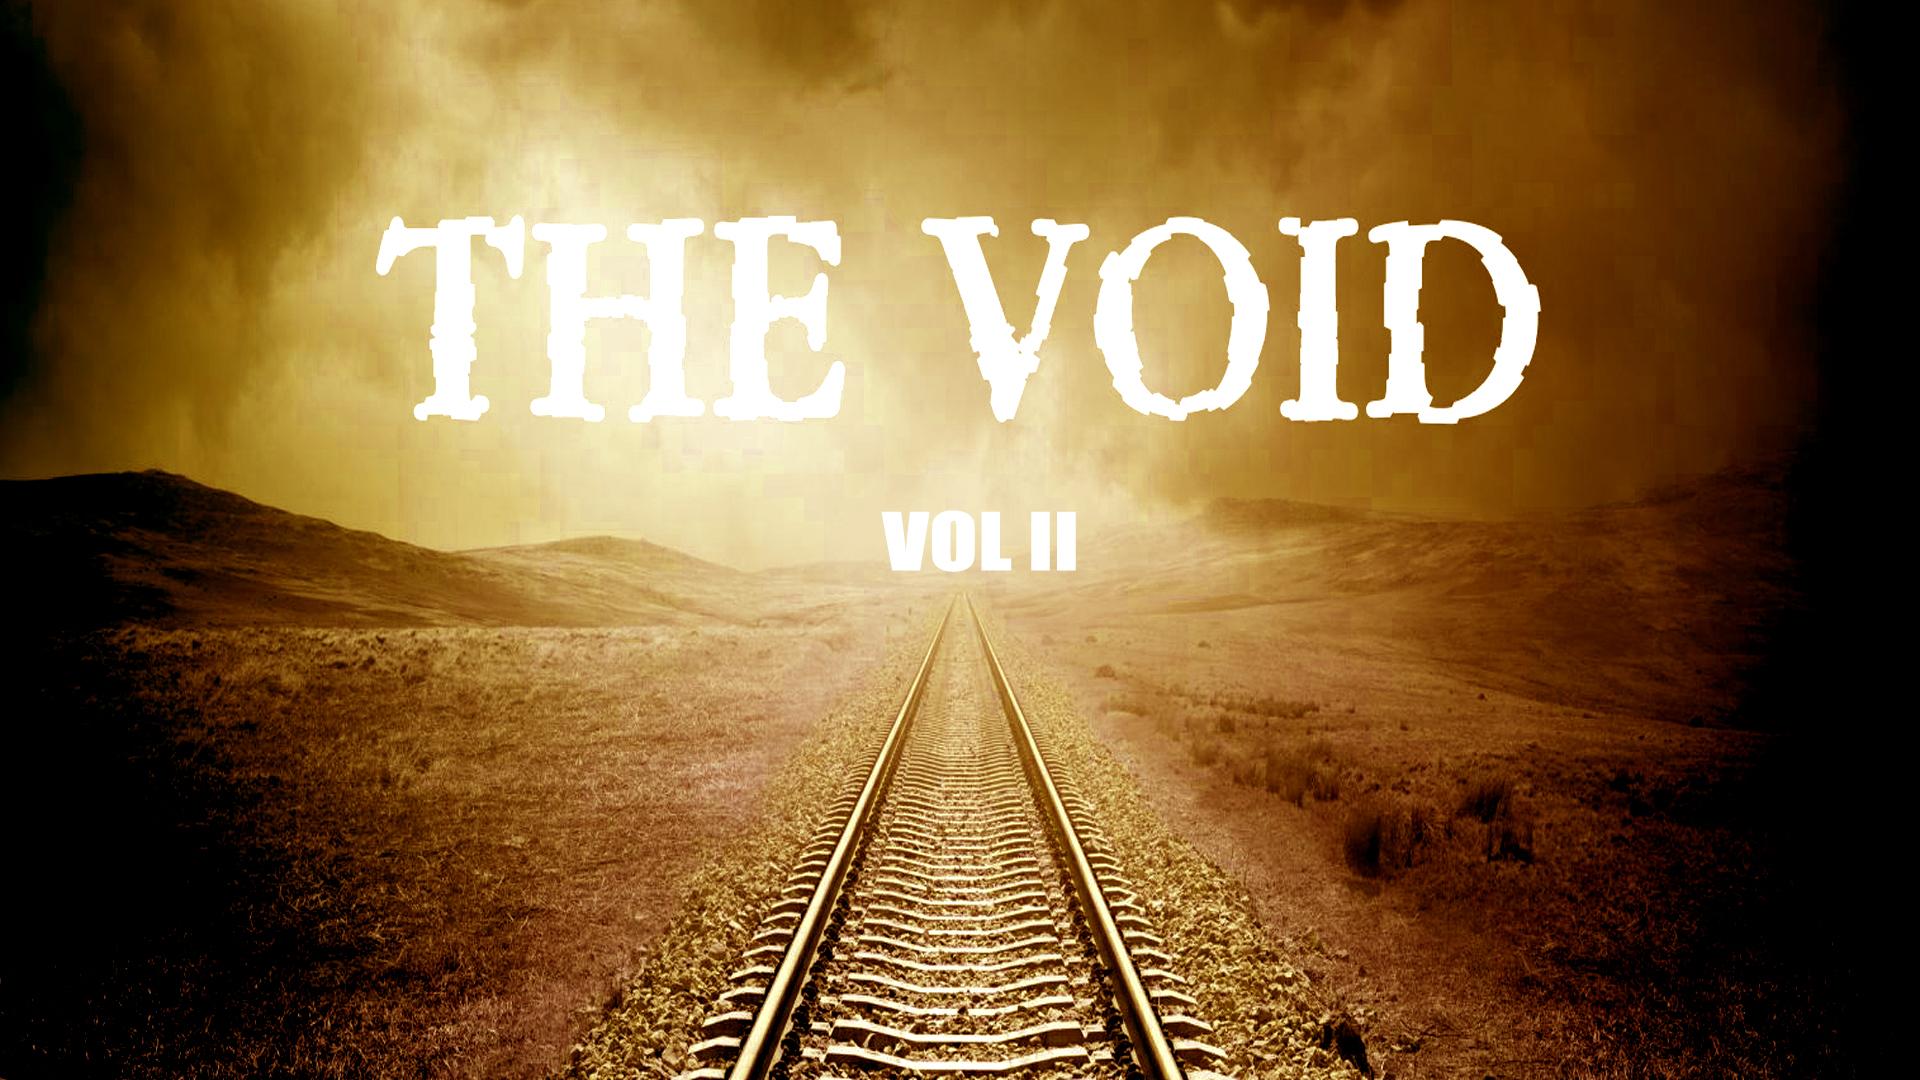 The Void Vol II